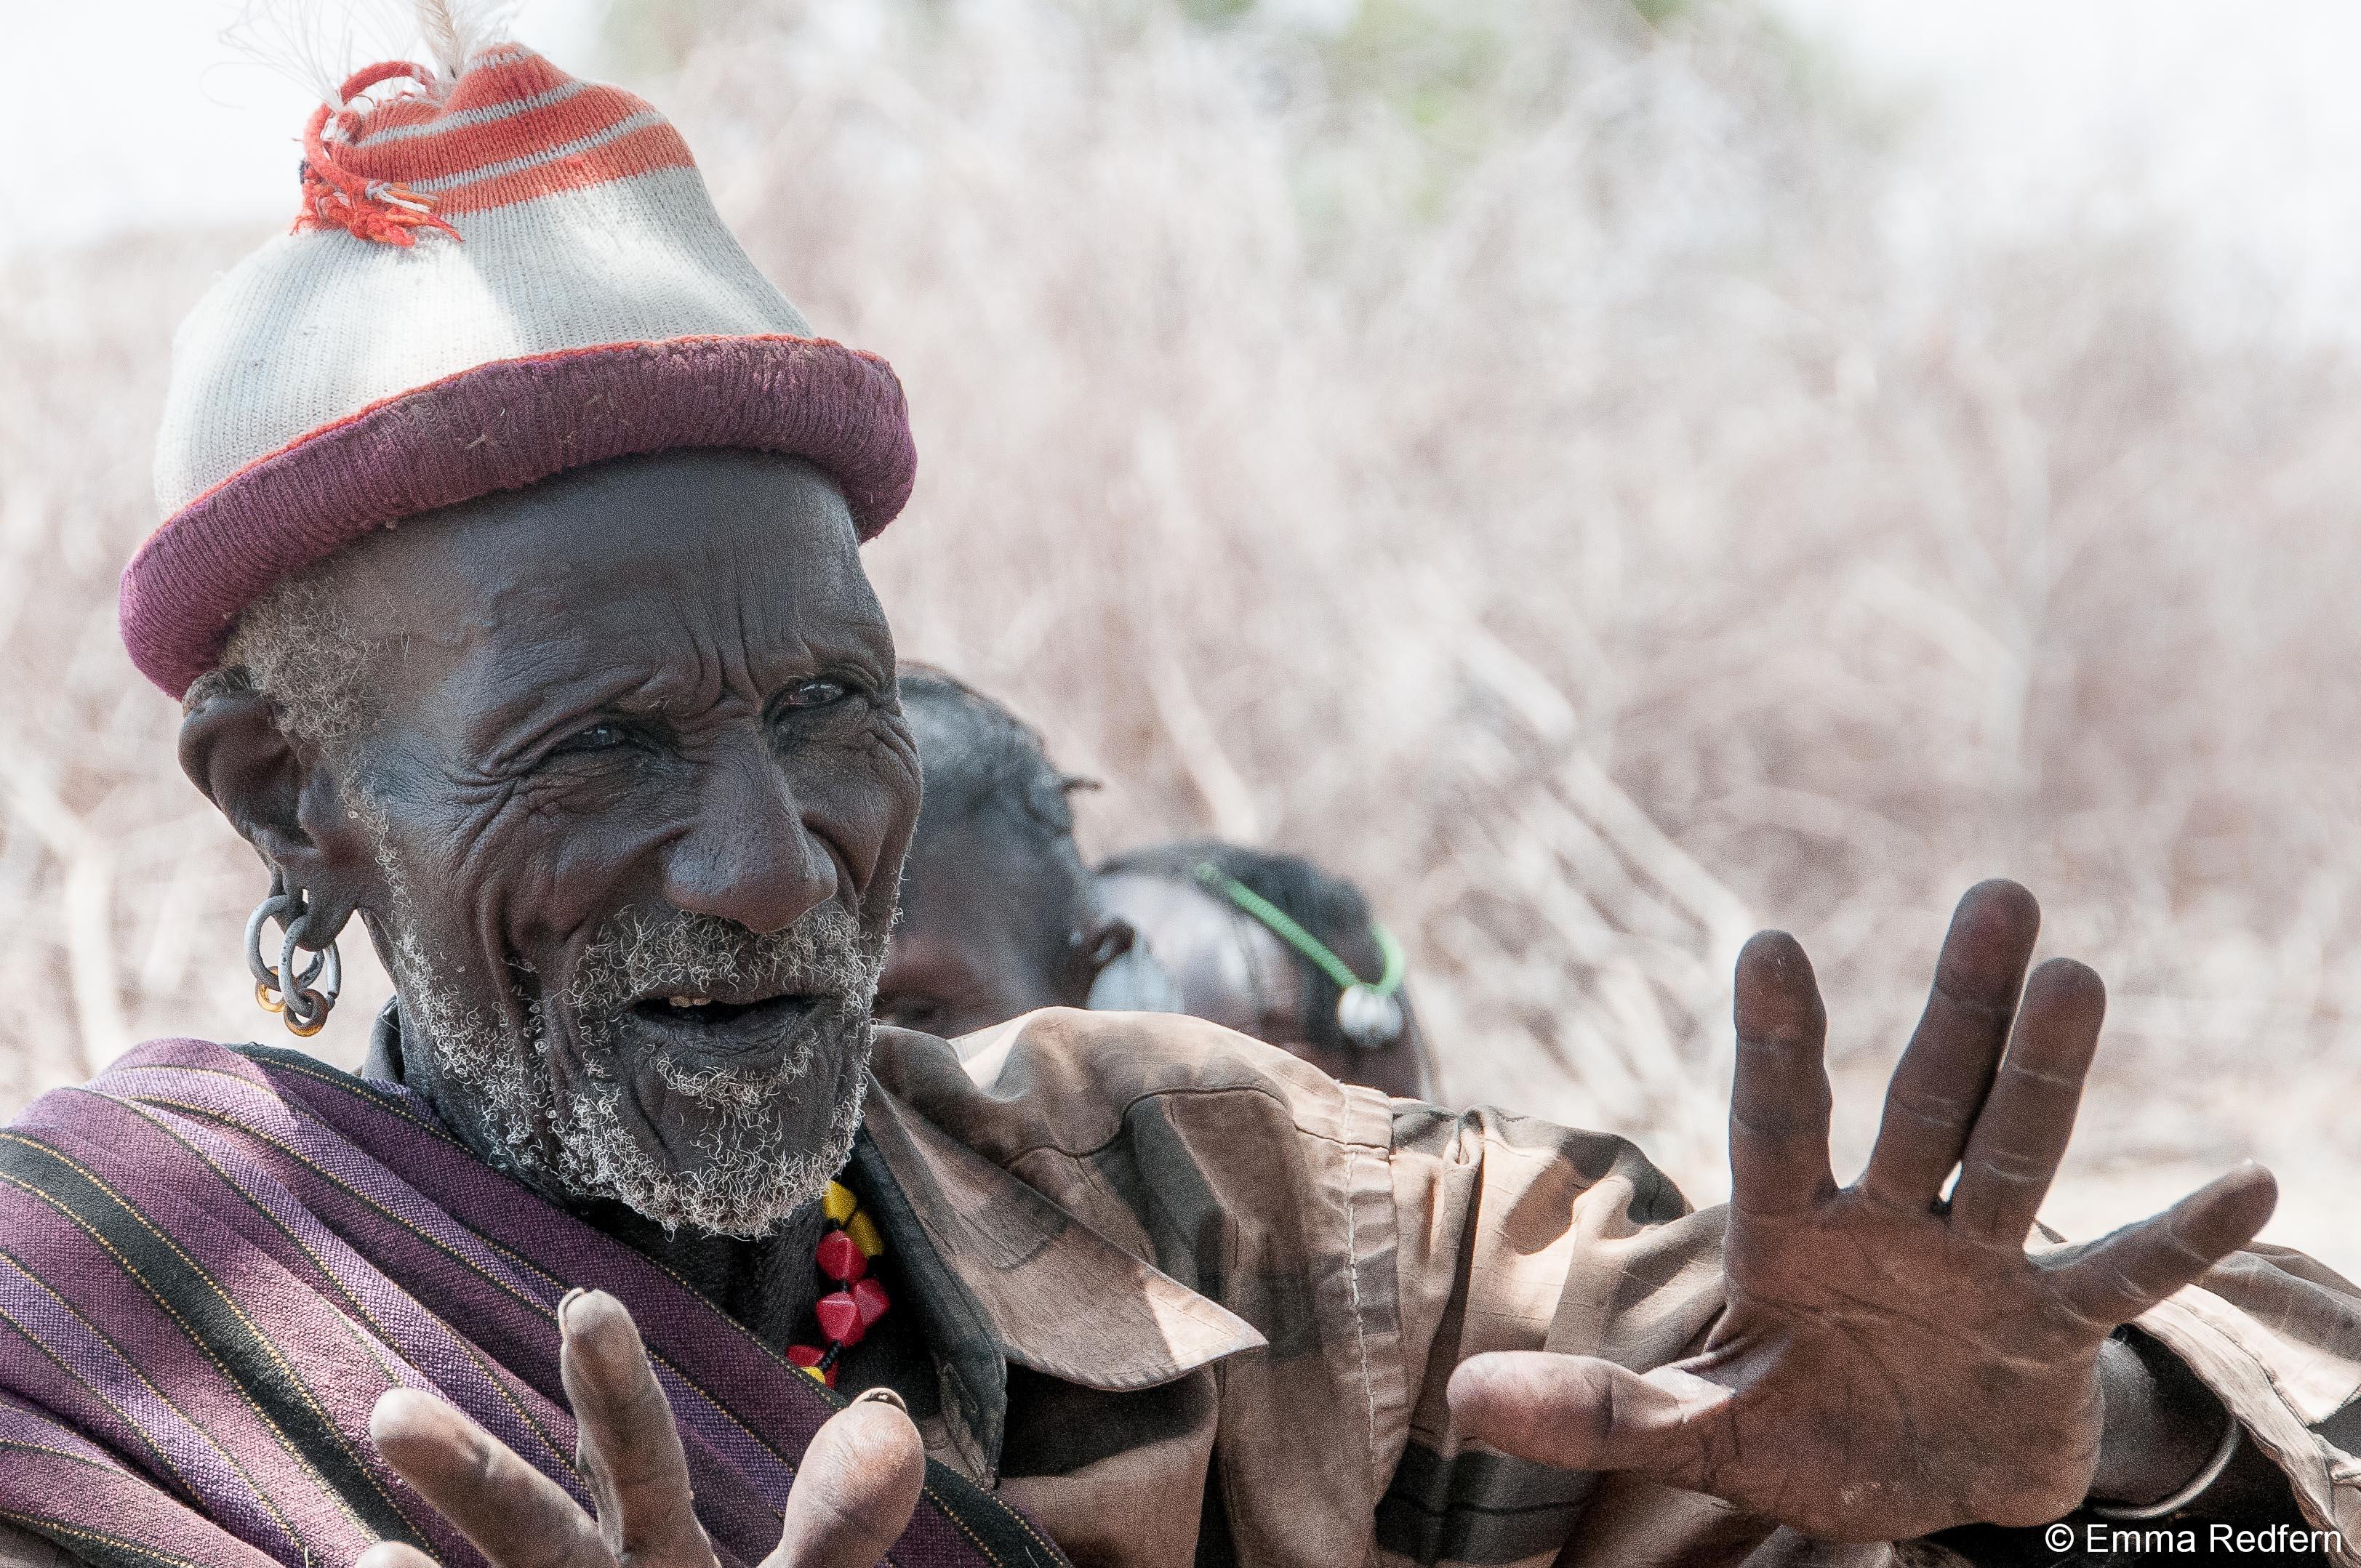 Turkana Mzee Talking about Climate Change